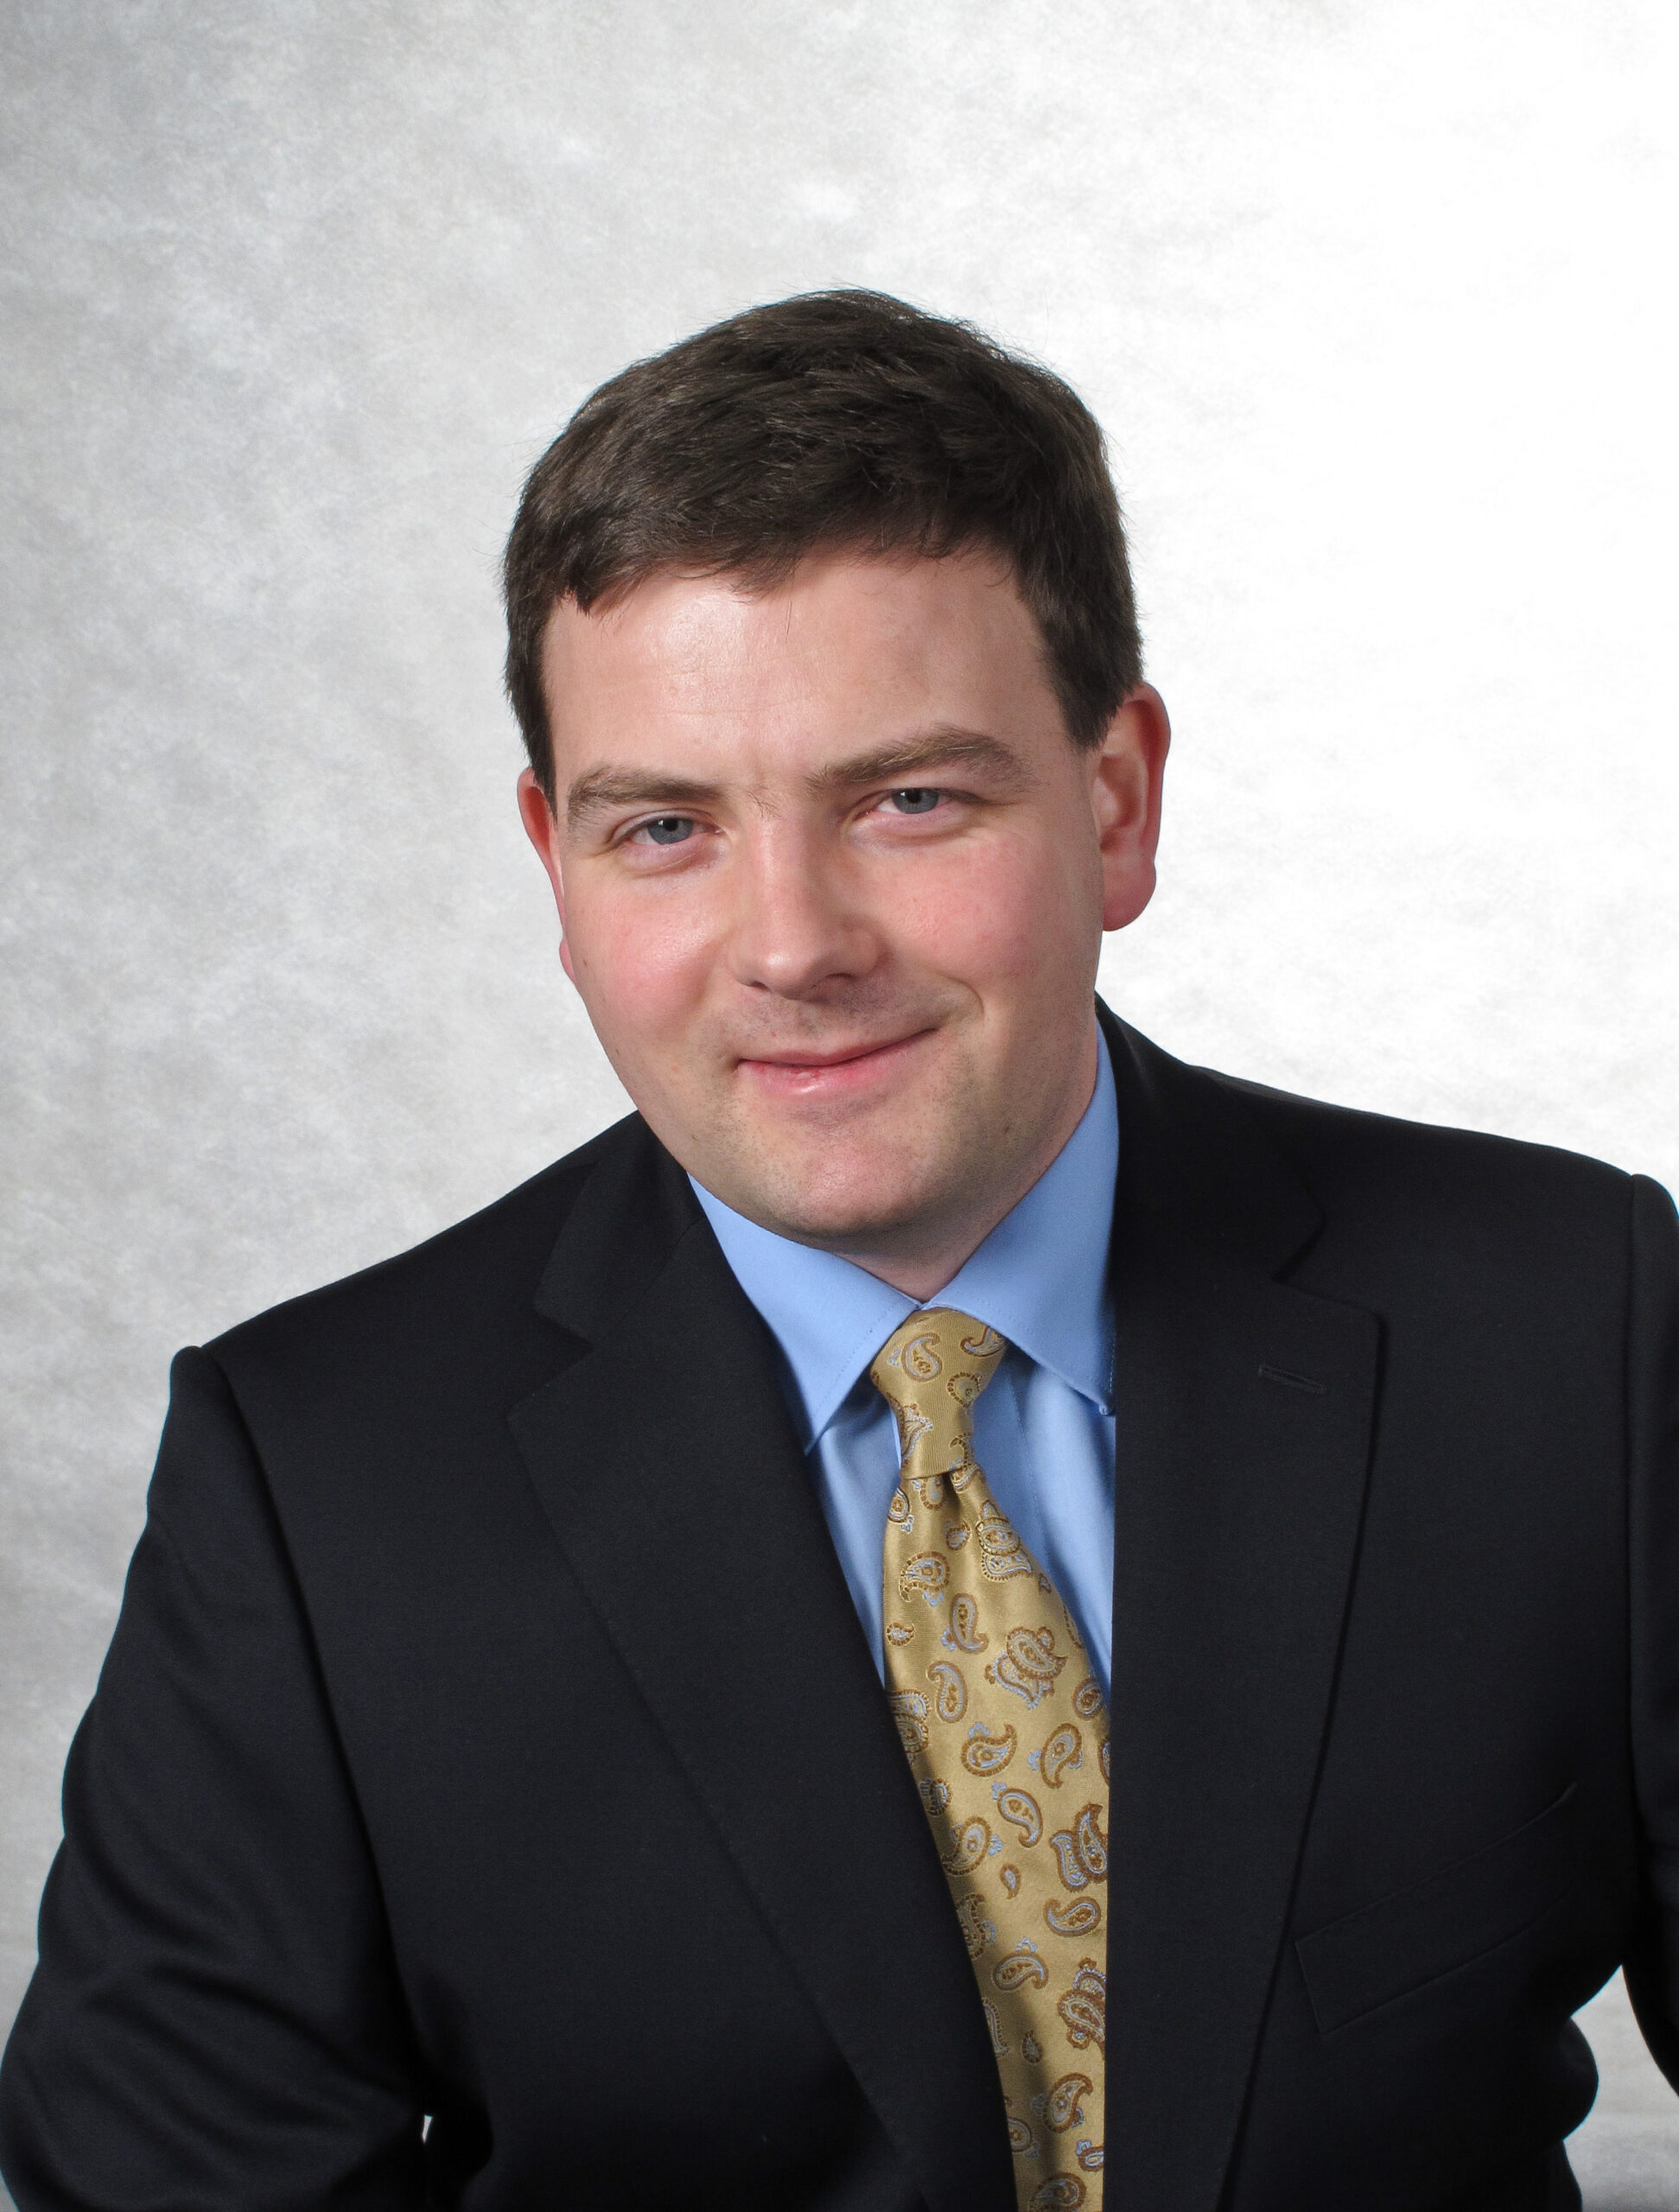 PD Dr. Felix Zwicker Profilbild